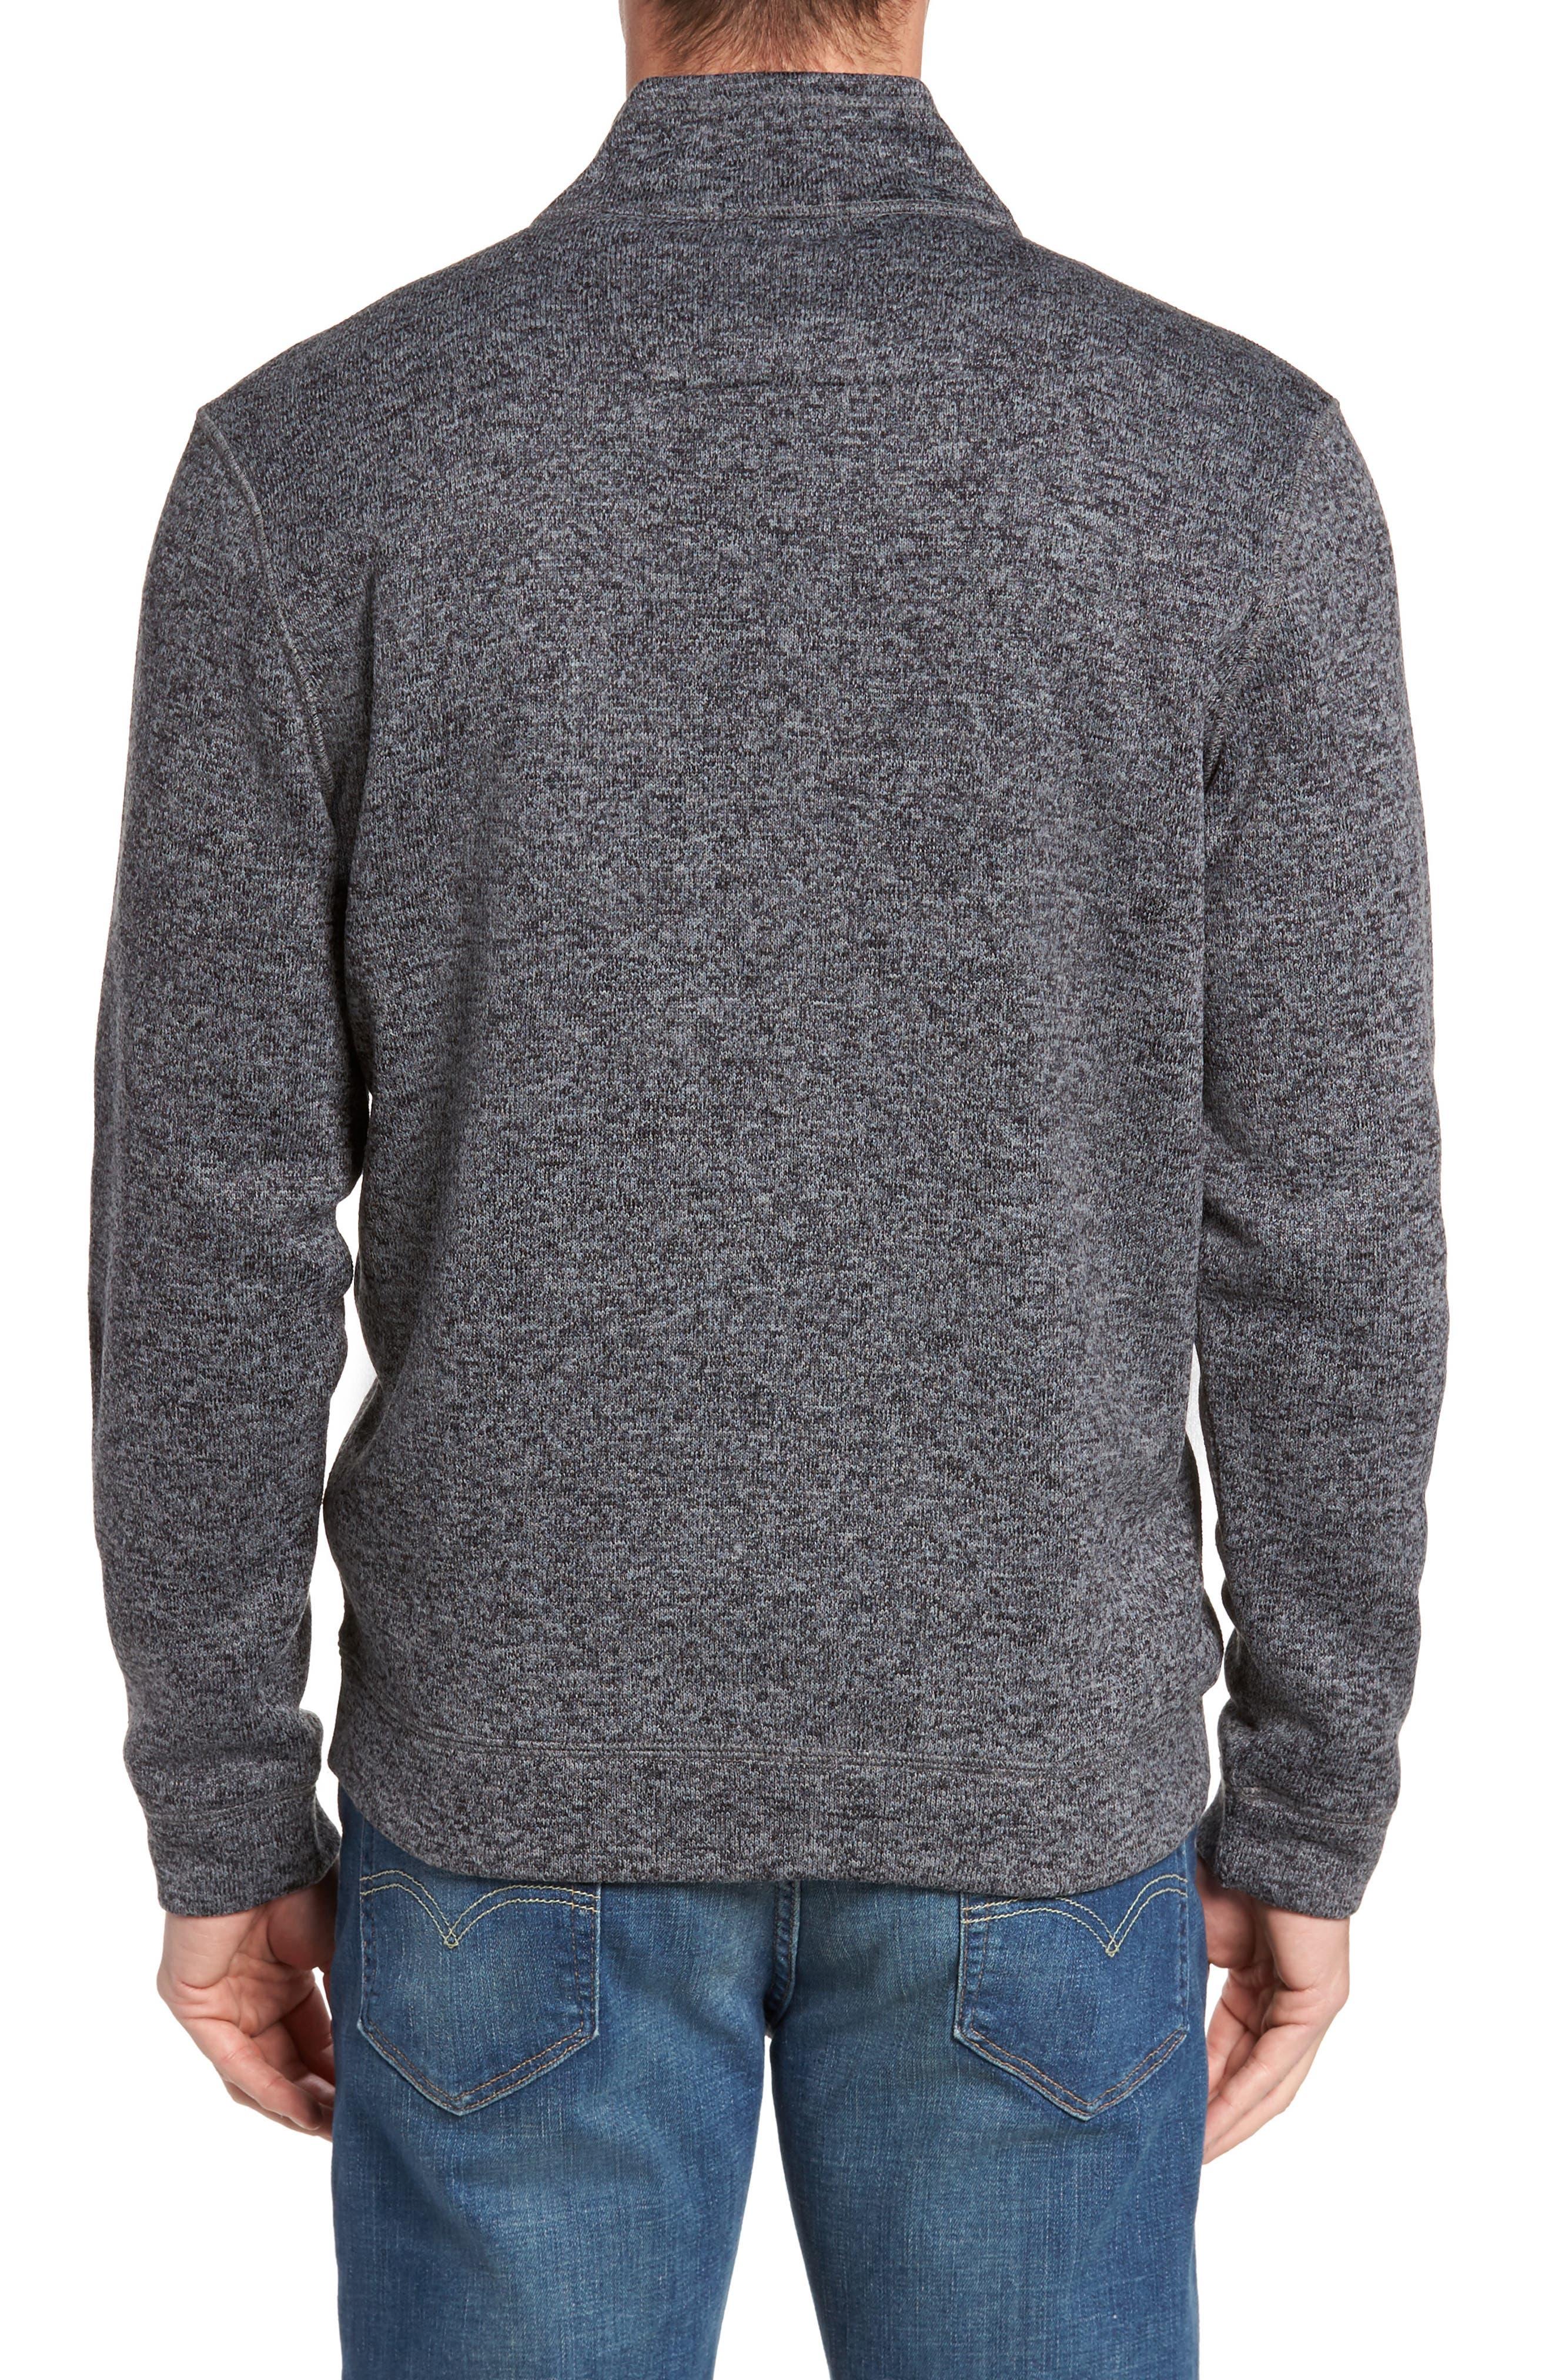 Sweater Knit Fleece Zip Front Jacket,                             Alternate thumbnail 4, color,